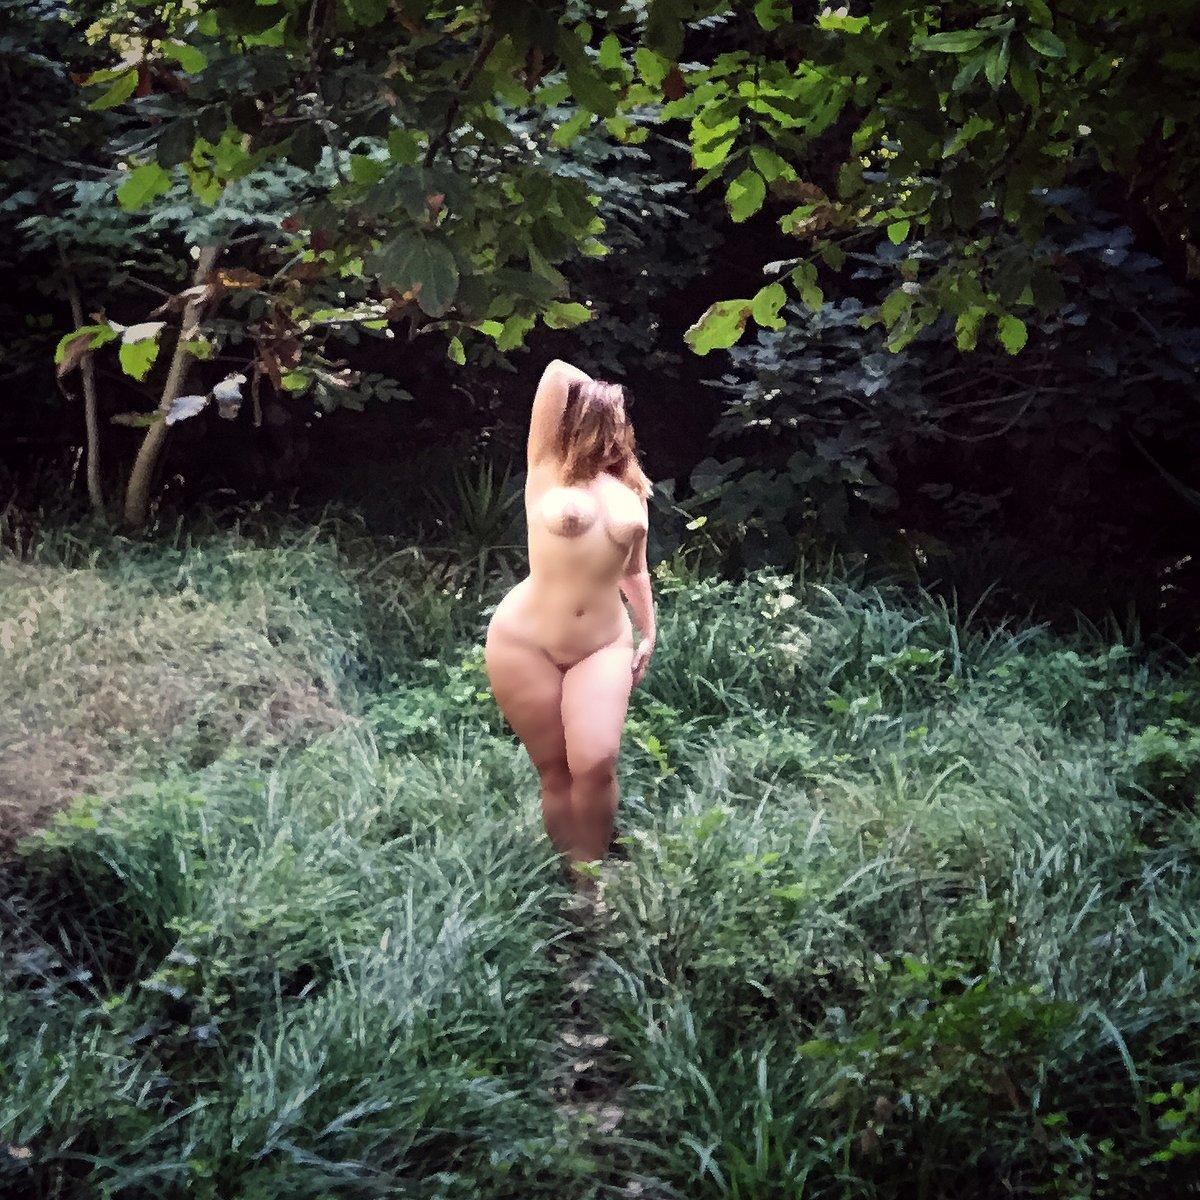 BBW_Curvy_Courtesan_Ivy_Grace_.Greecejpg.jpg